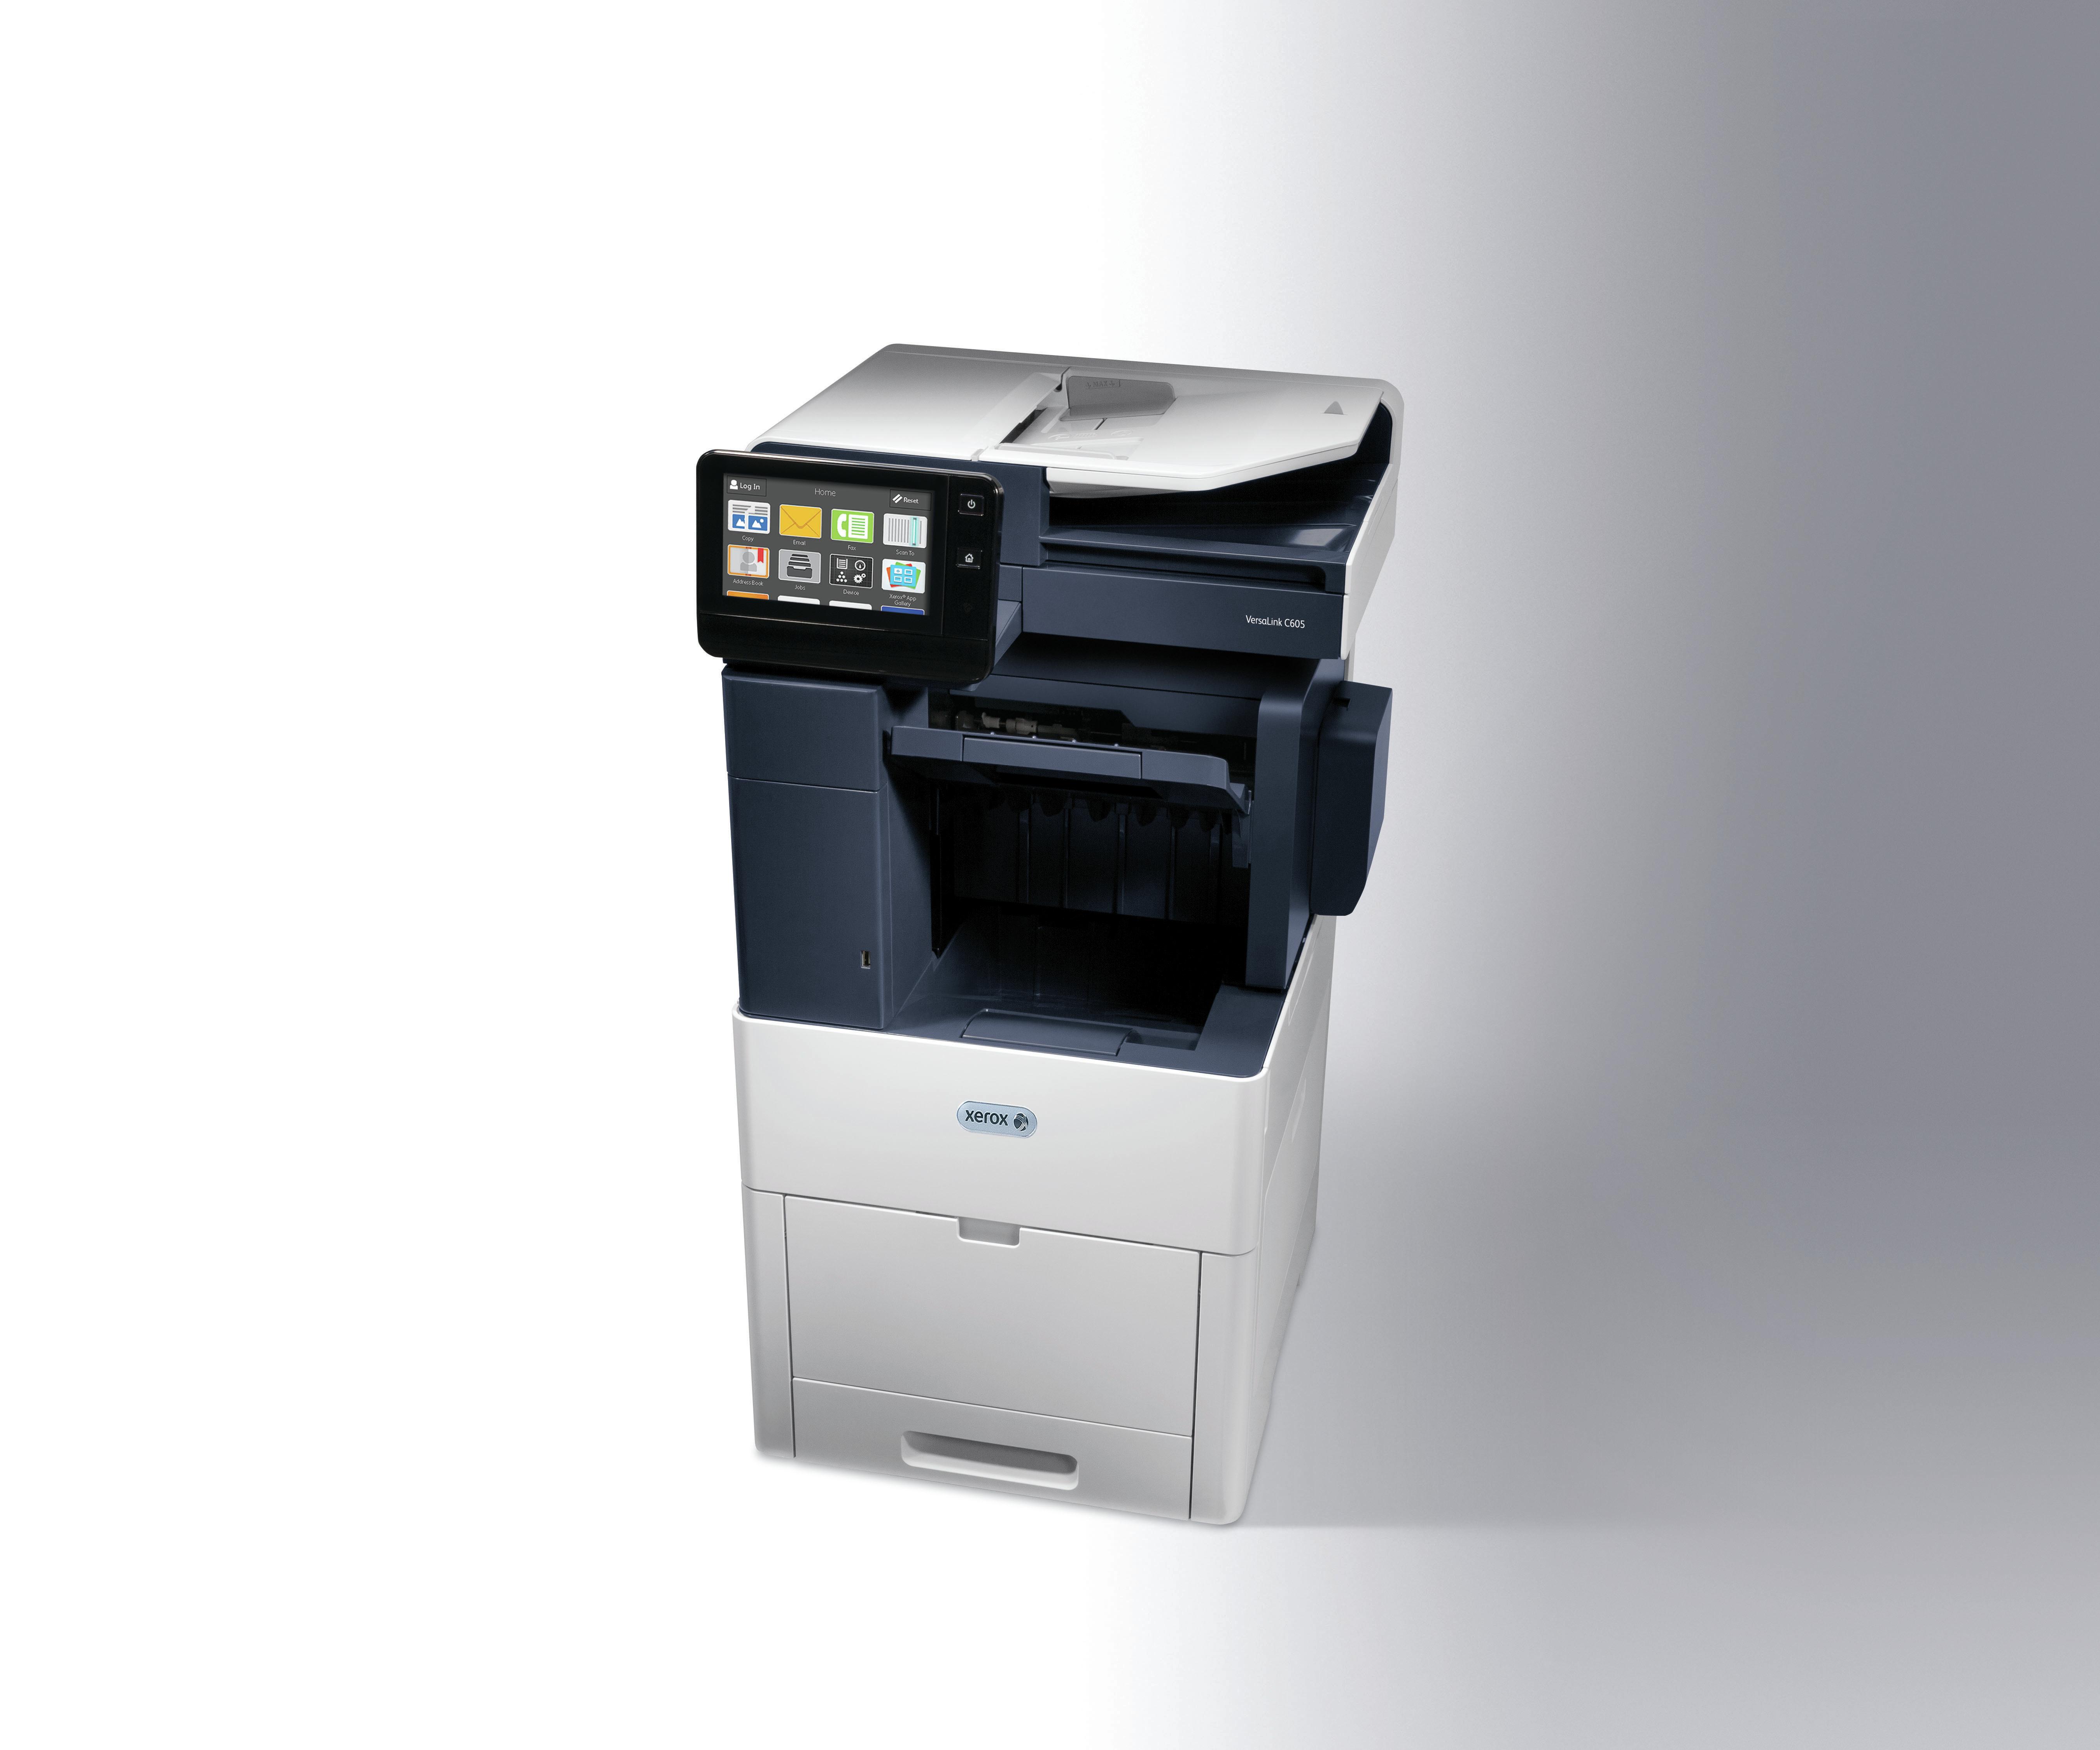 Xerox VersaLink C605V_XL Multifunktionsgerät Laser 53 Seiten pro Minute 1200 x 2400 DPI A4 WLAN